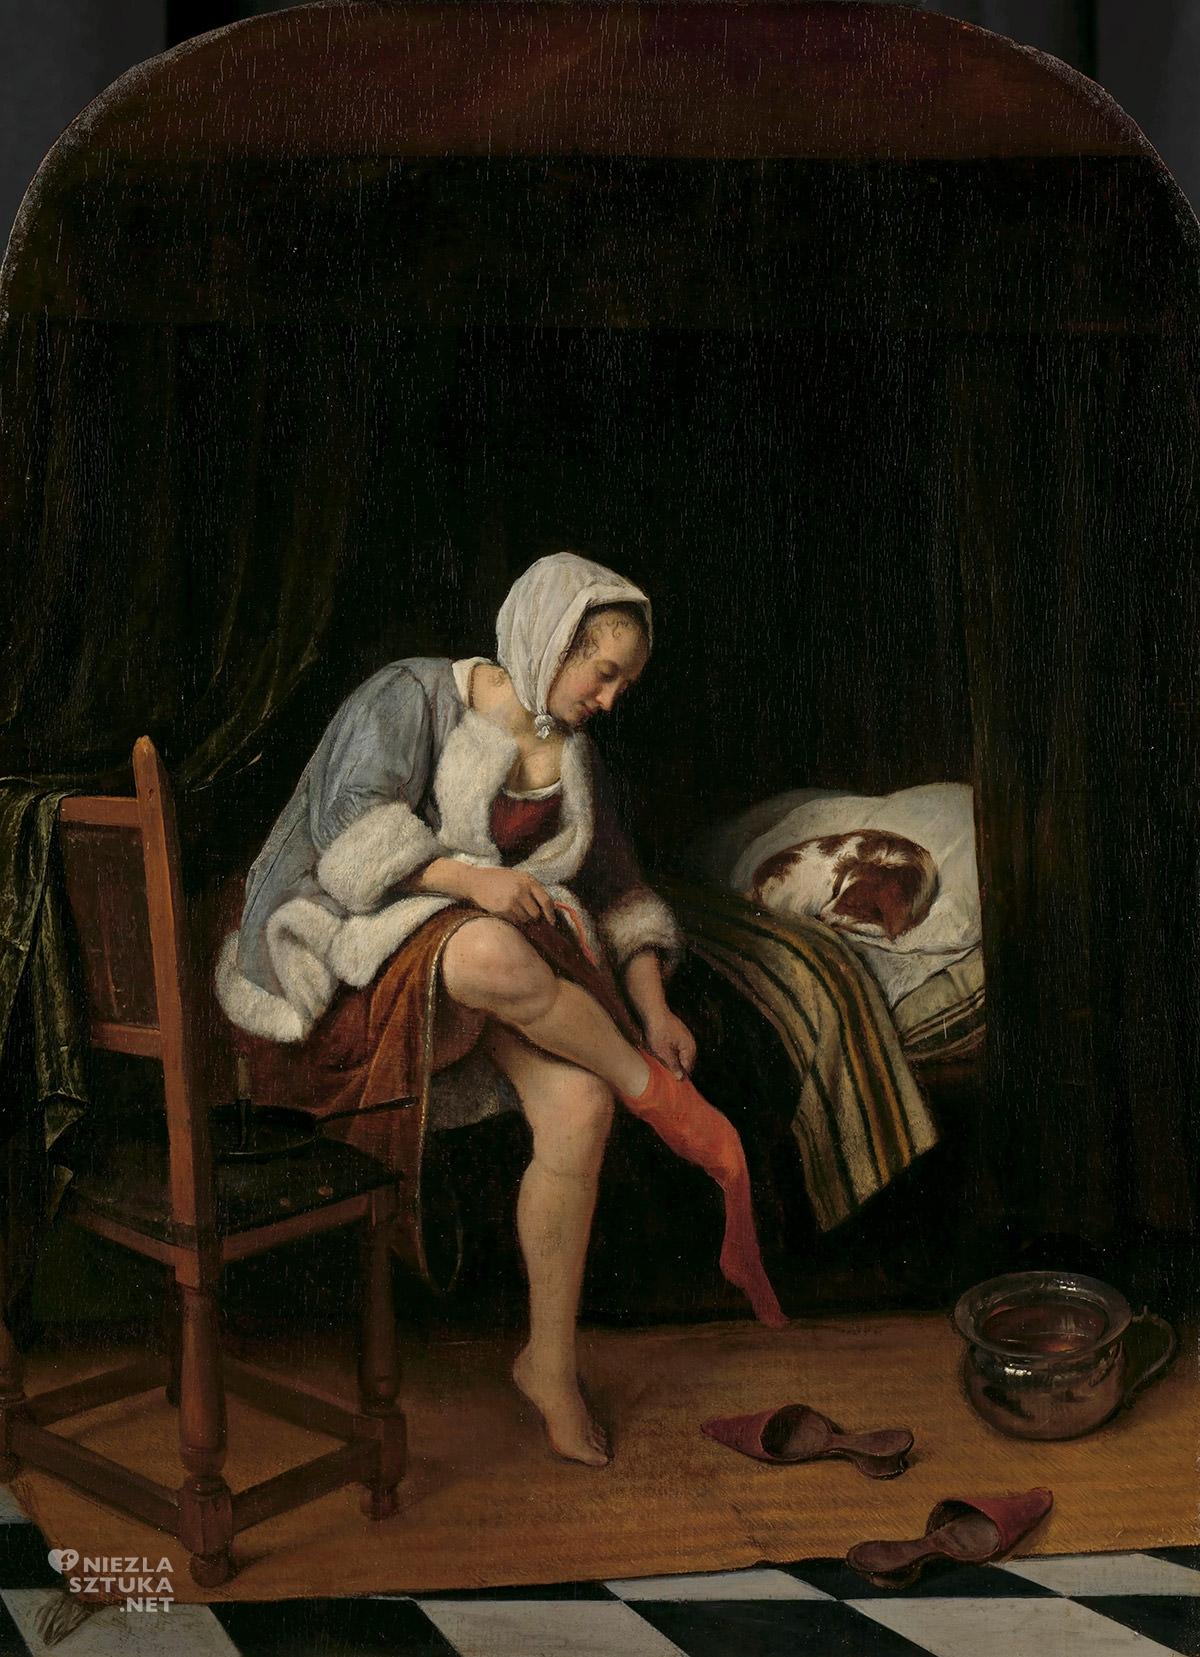 Jan Steen, Kobieta w toalecie, sztuka holenderska, Niezła Sztuka